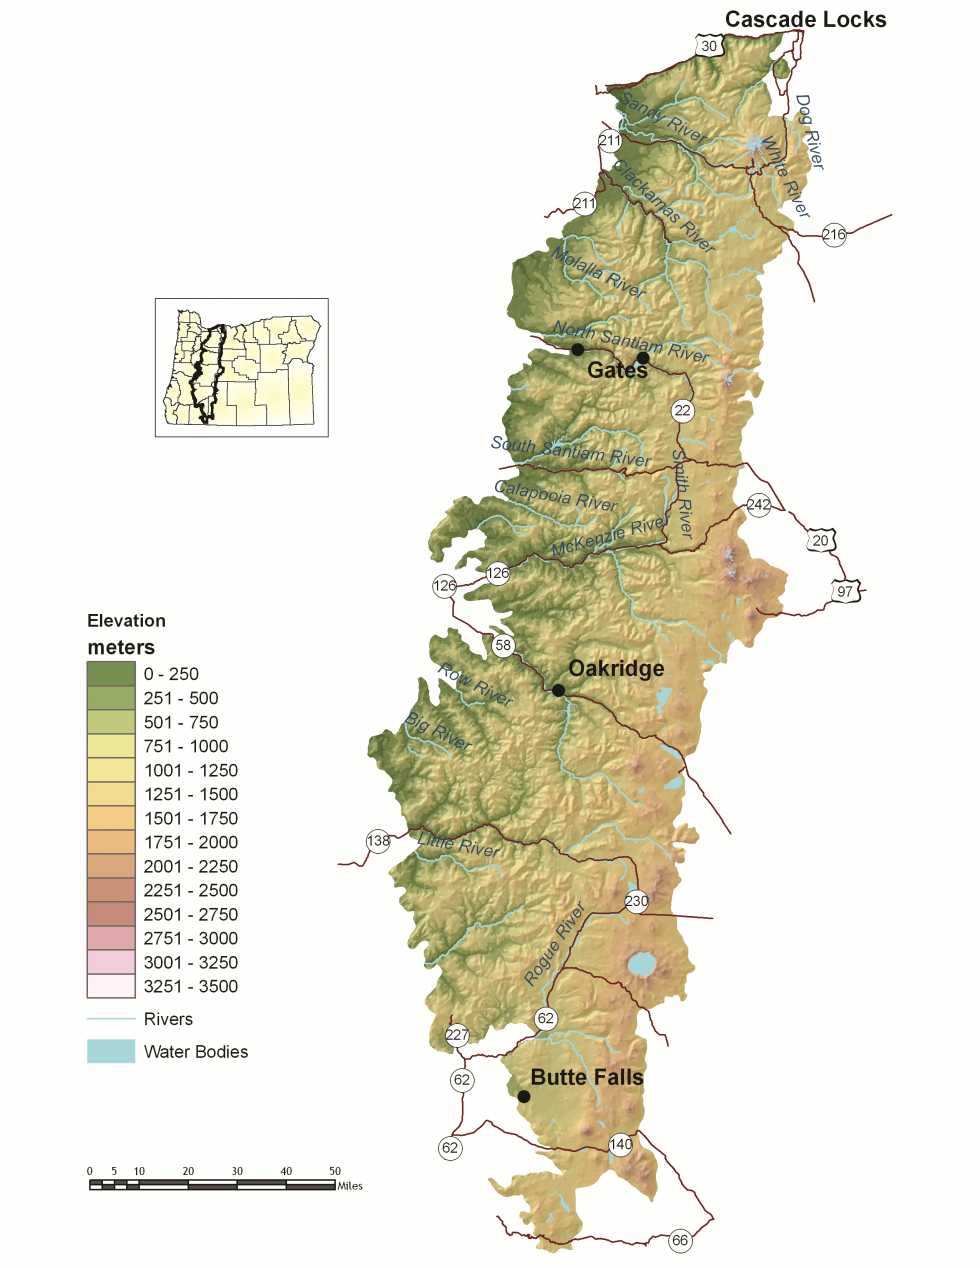 Cascade Locks Fire Map.West Cascades Oregon Conservation Strategy